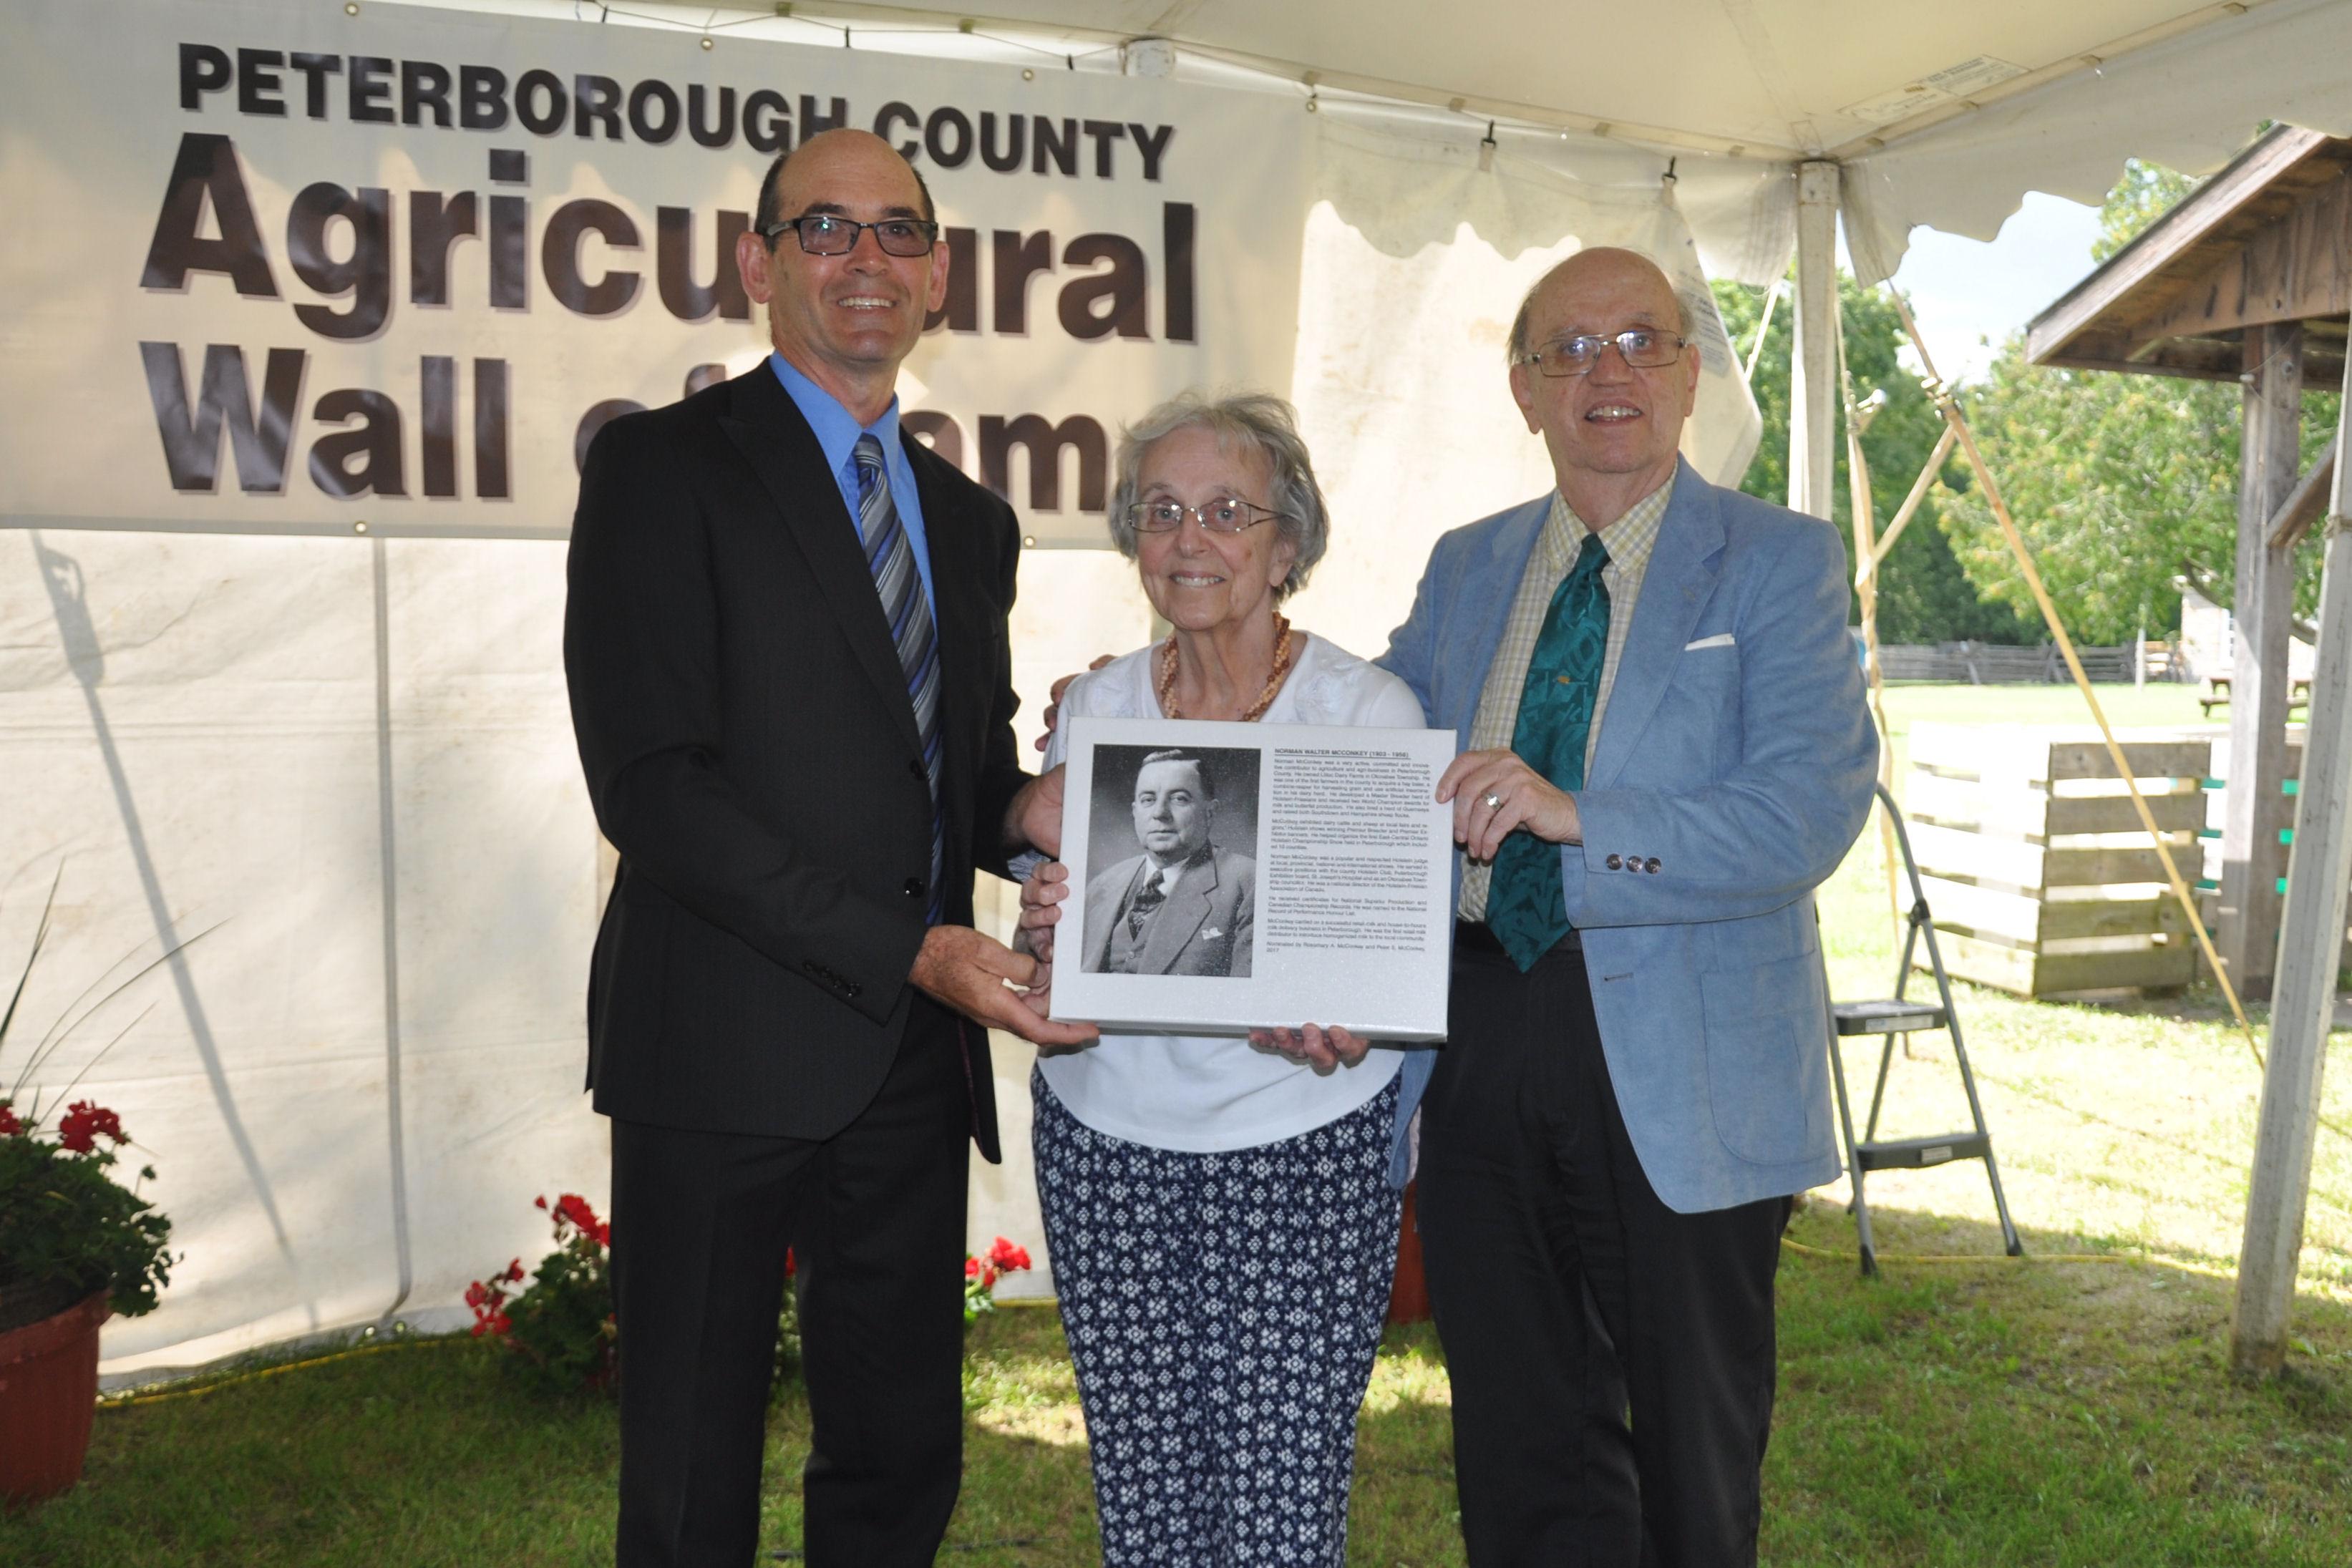 Wayne Warner, Rosemary A McConkey, Peter E McConkey